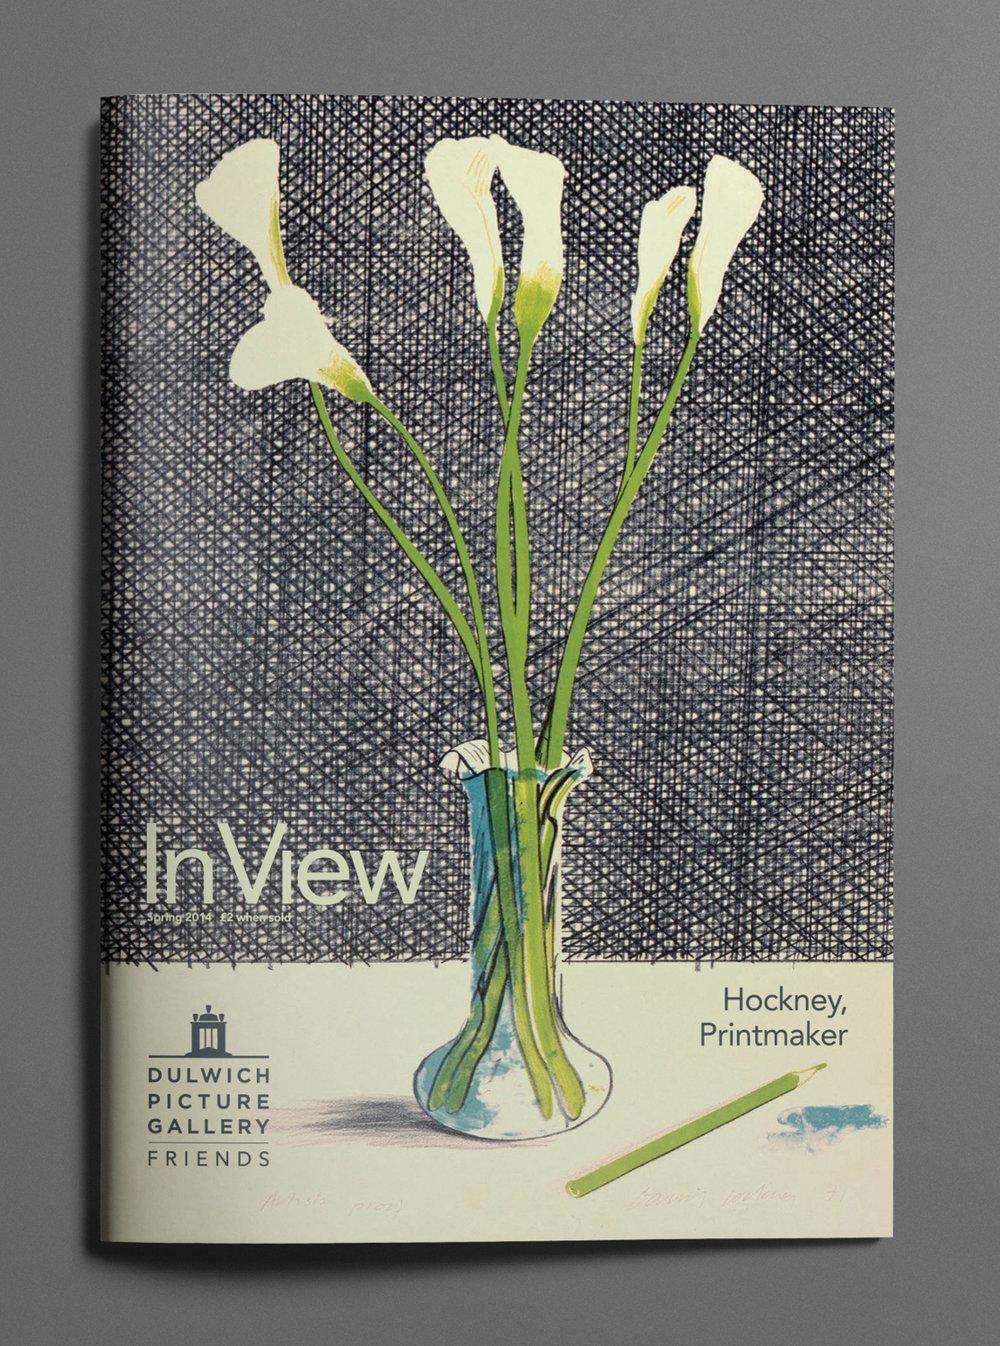 inviewspr-cover3low.jpg